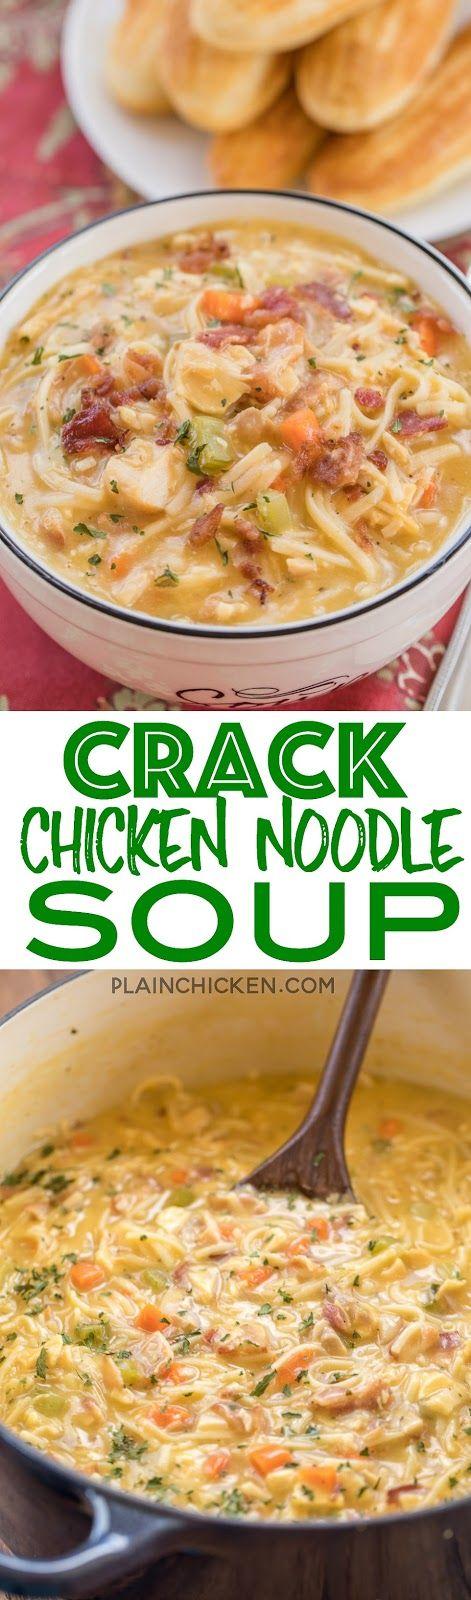 CRACK CHICKEN NOODLE SOUP RECIPES